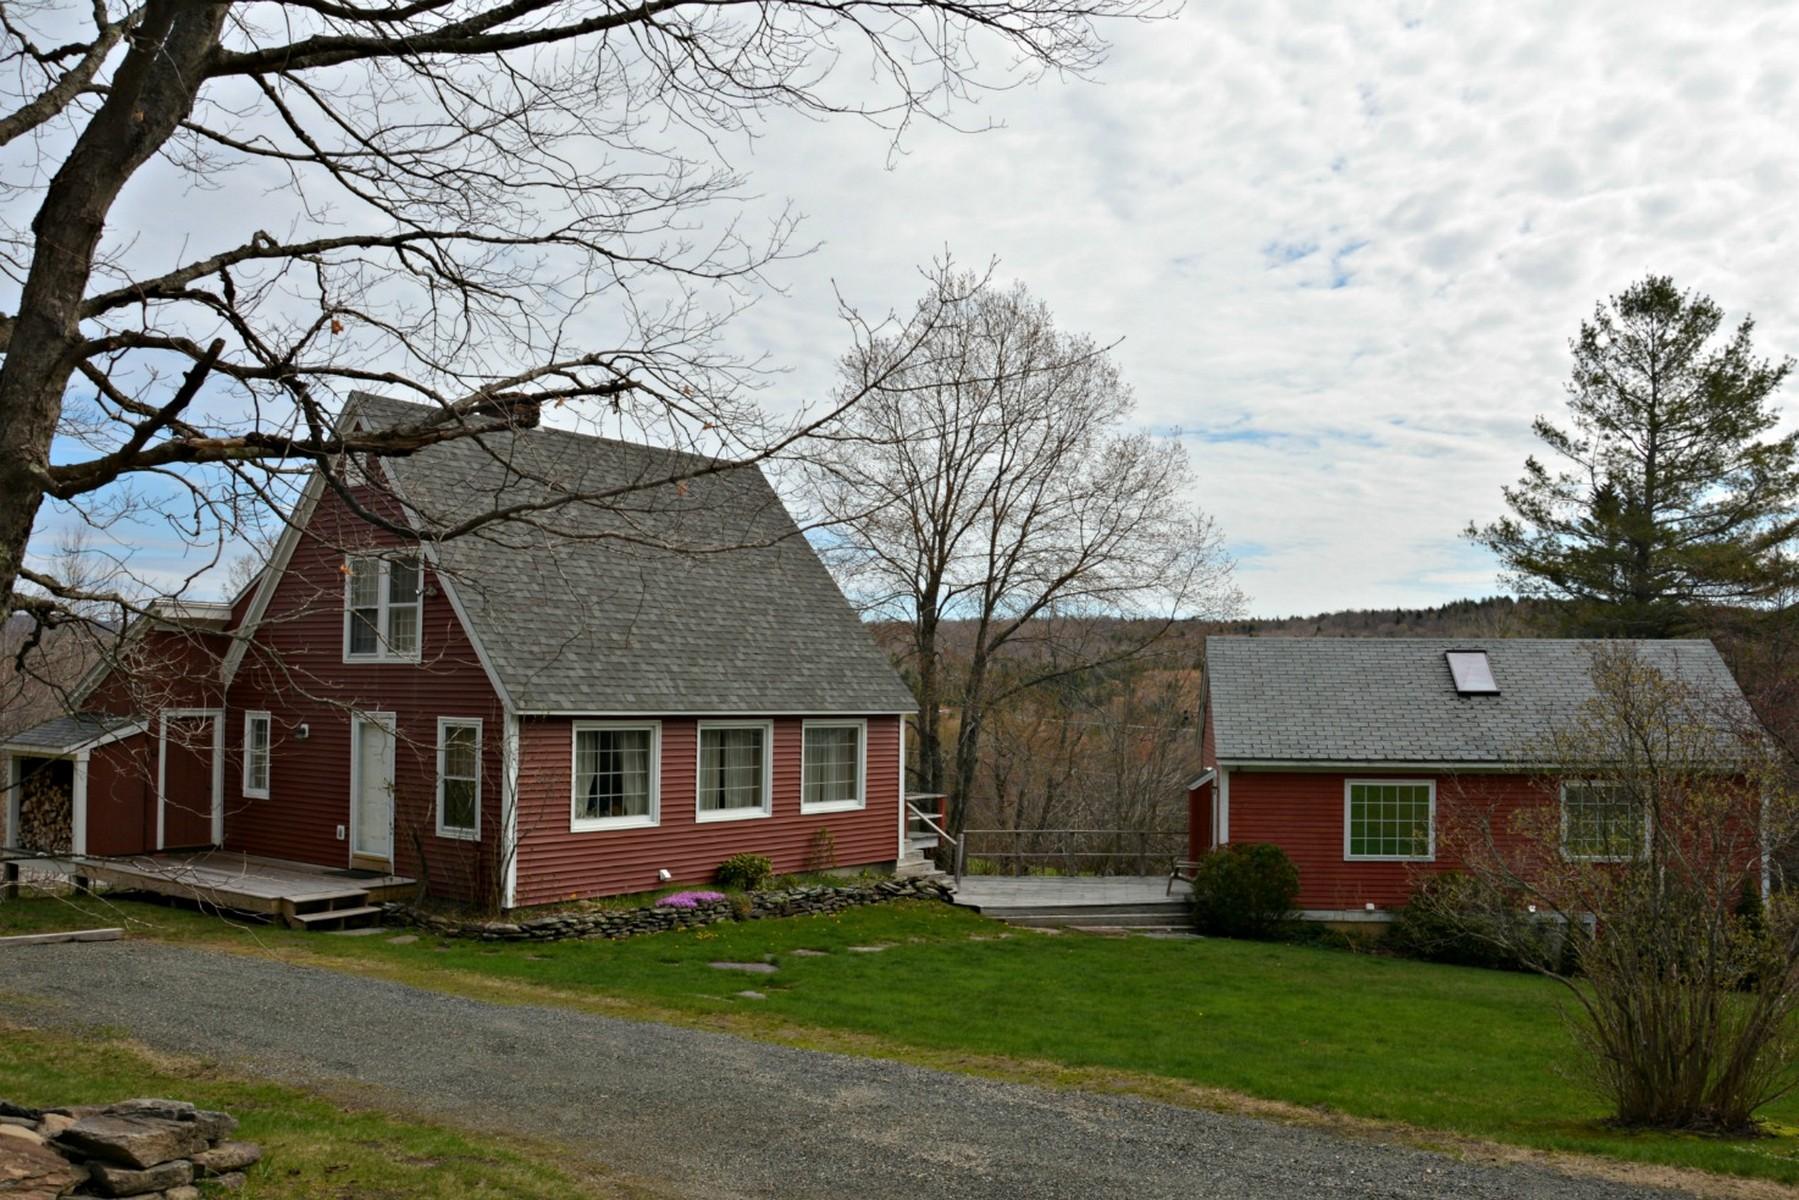 獨棟家庭住宅 為 出售 在 Artistic Cape and Guest House 27 Sturgis Rd Wilmington, 佛蒙特州, 05363 美國